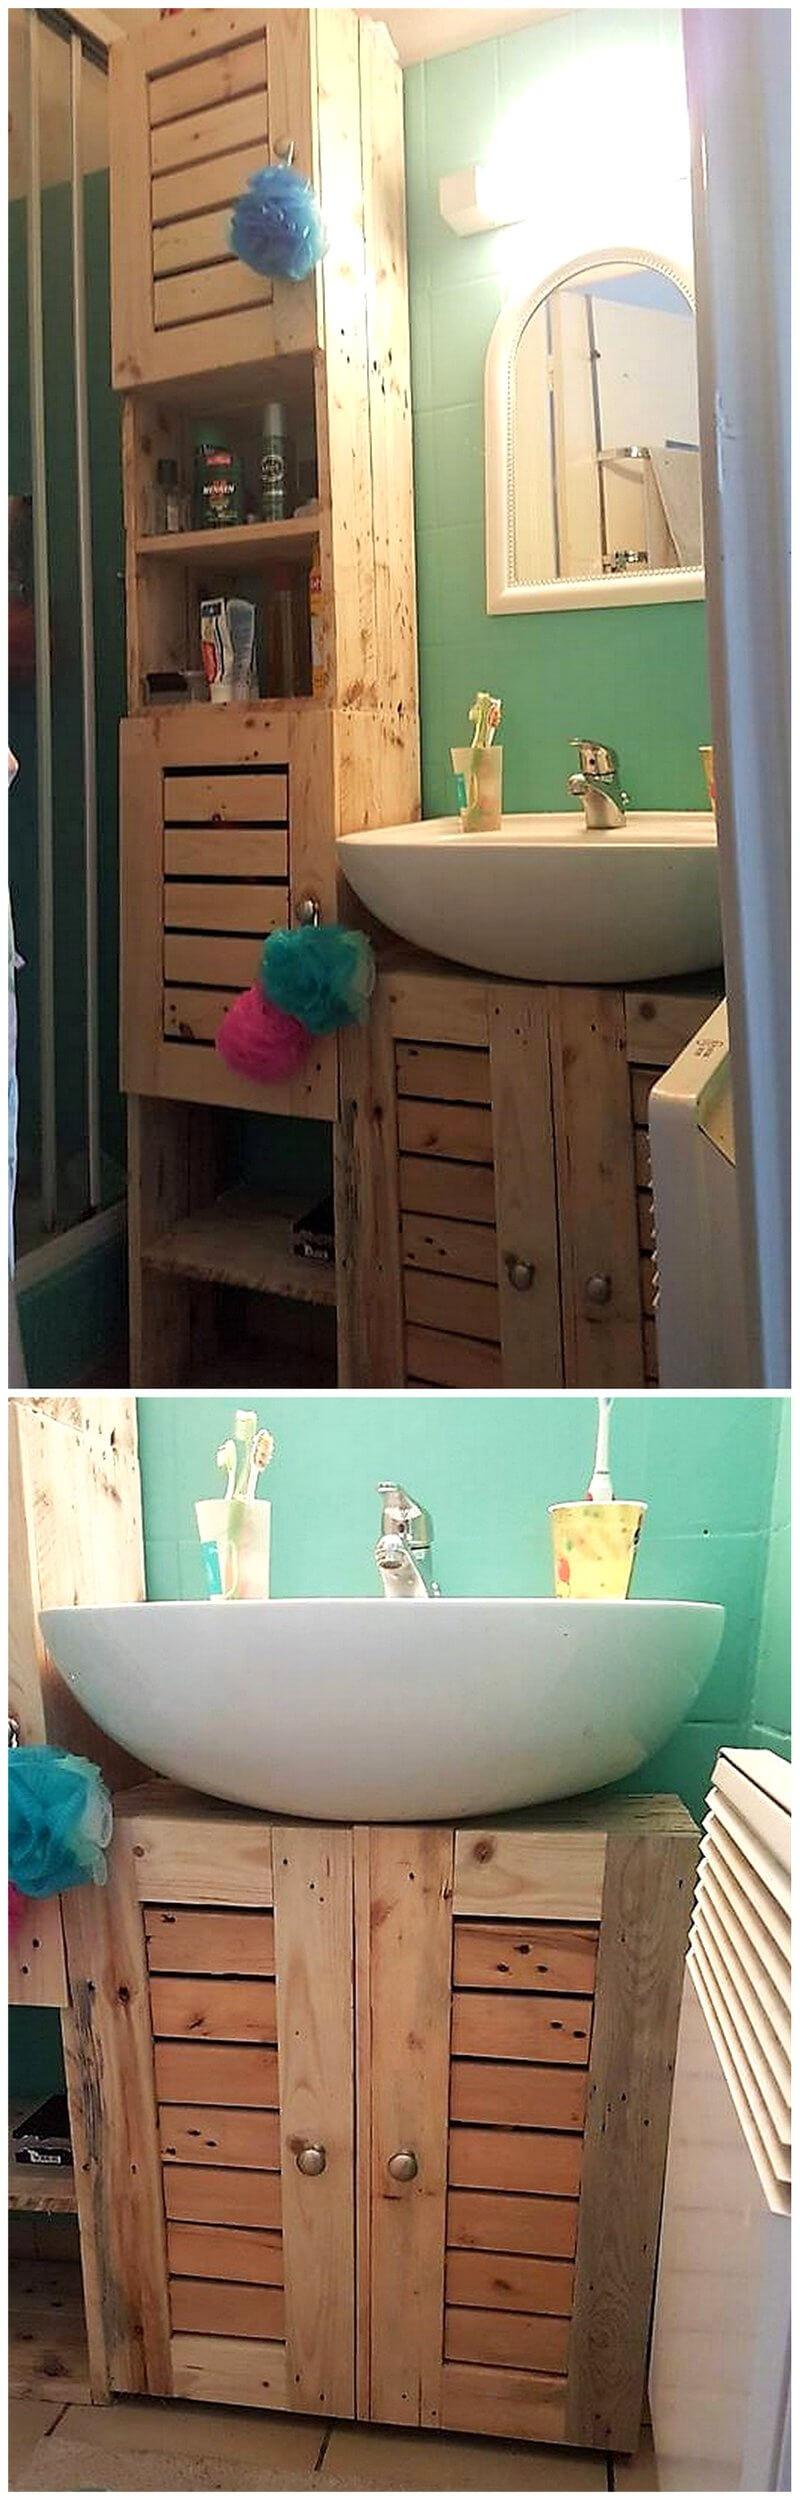 bathroom storage idea with wood pallets